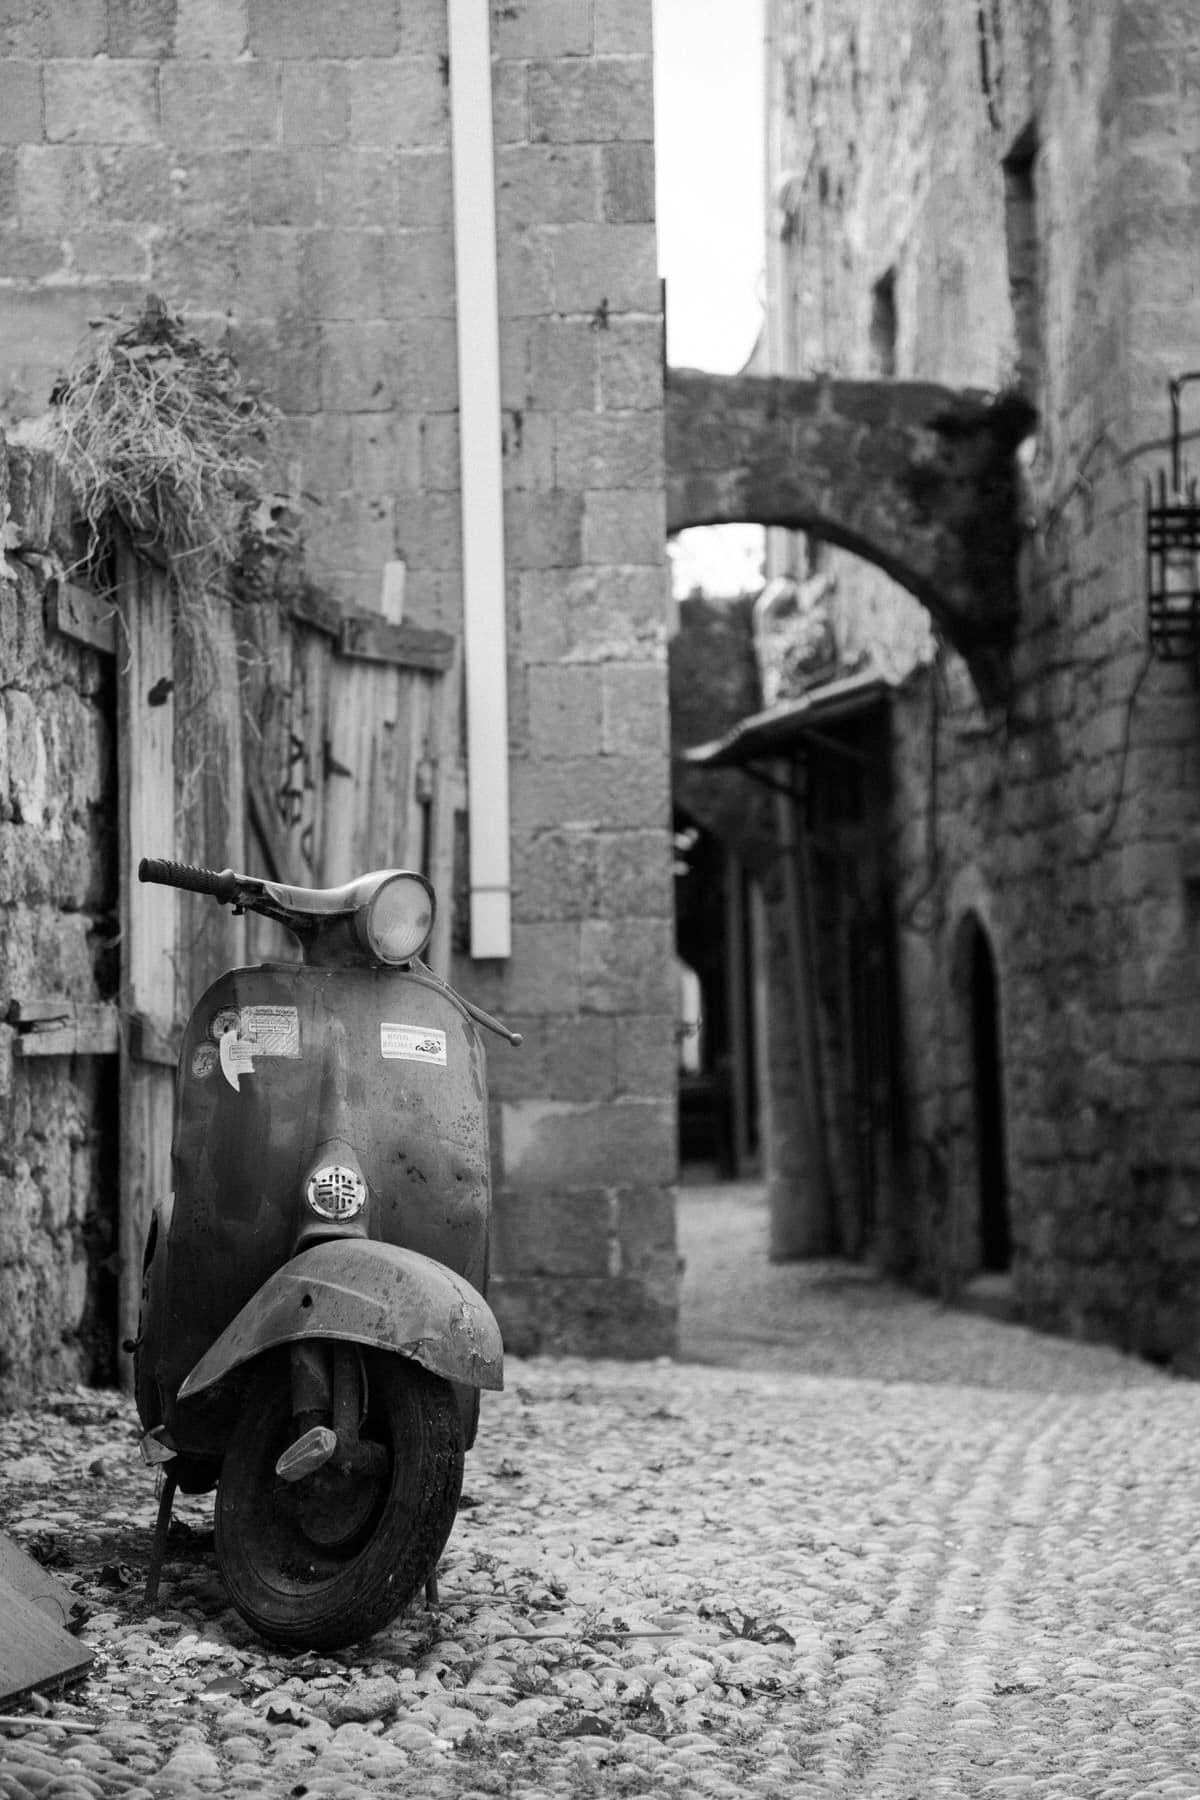 Rhodes-Greece-Island-black-and-white-fine-art-photography-by-Studio-L-photographer-Laura-Schneider-_2713